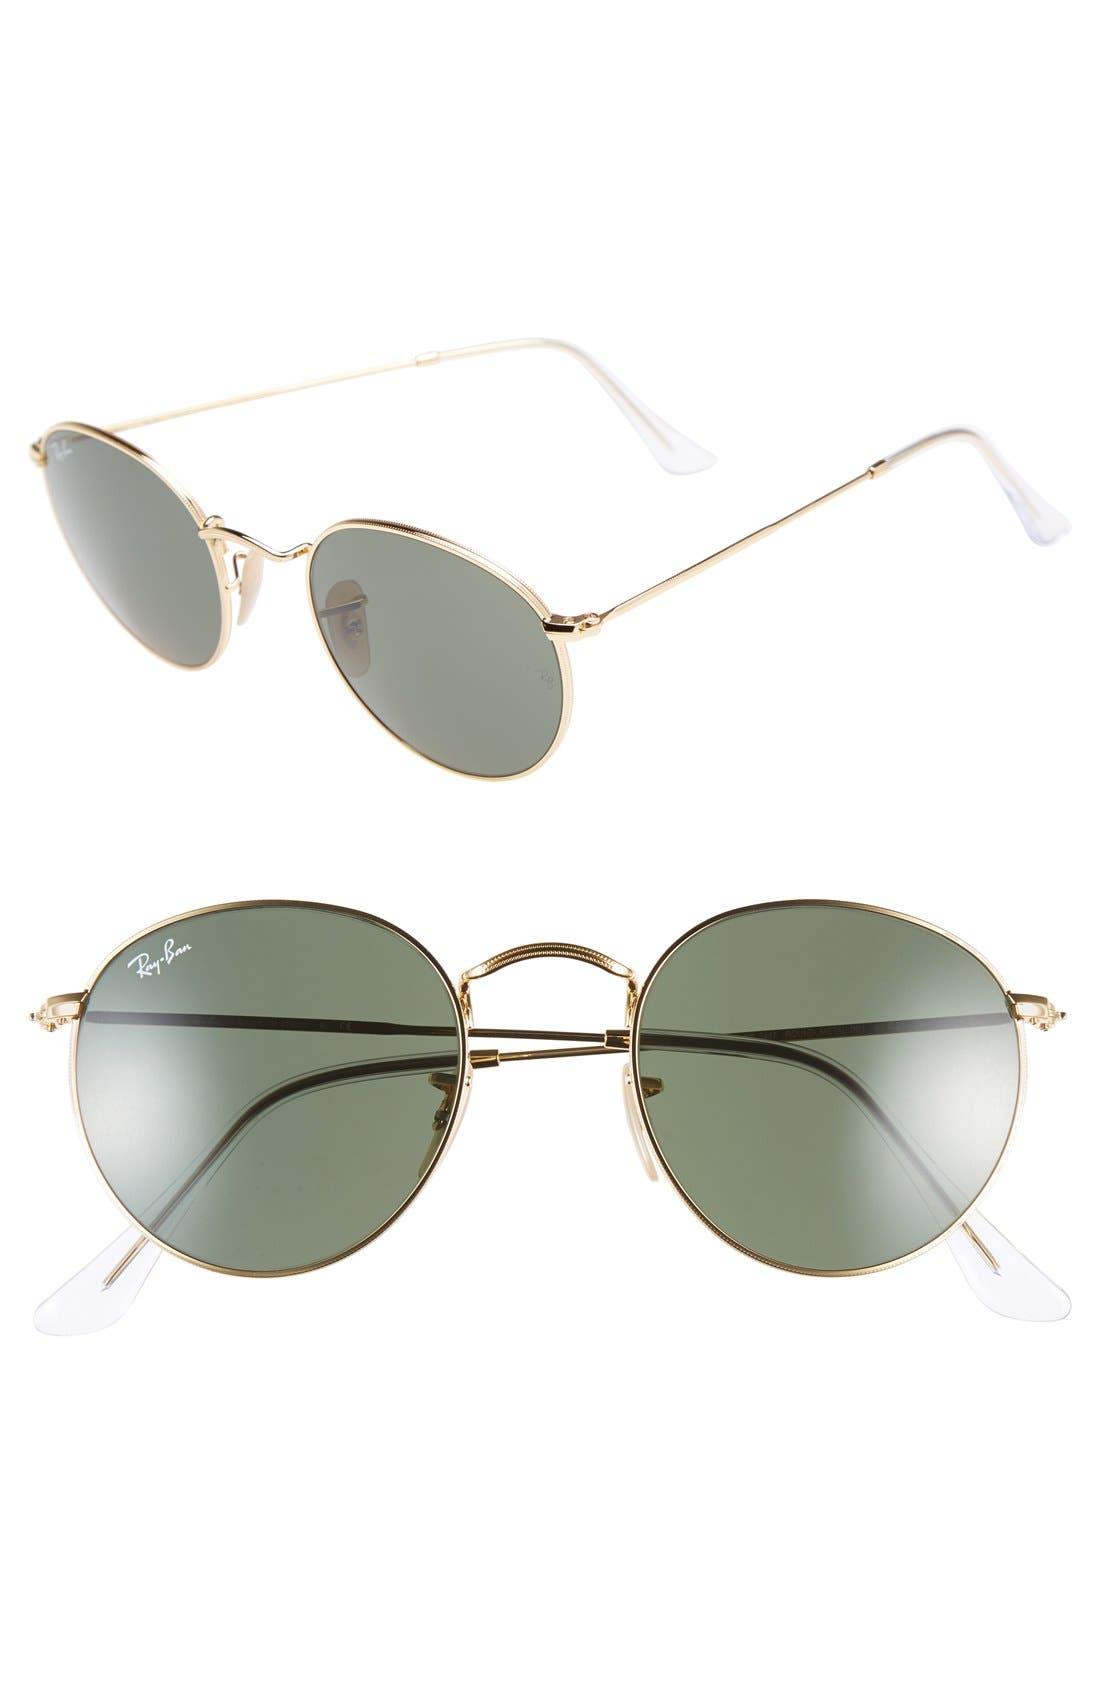 RAY-BAN, Icons 50mm Round Metal Sunglasses, Main thumbnail 1, color, GOLD/ GREEN